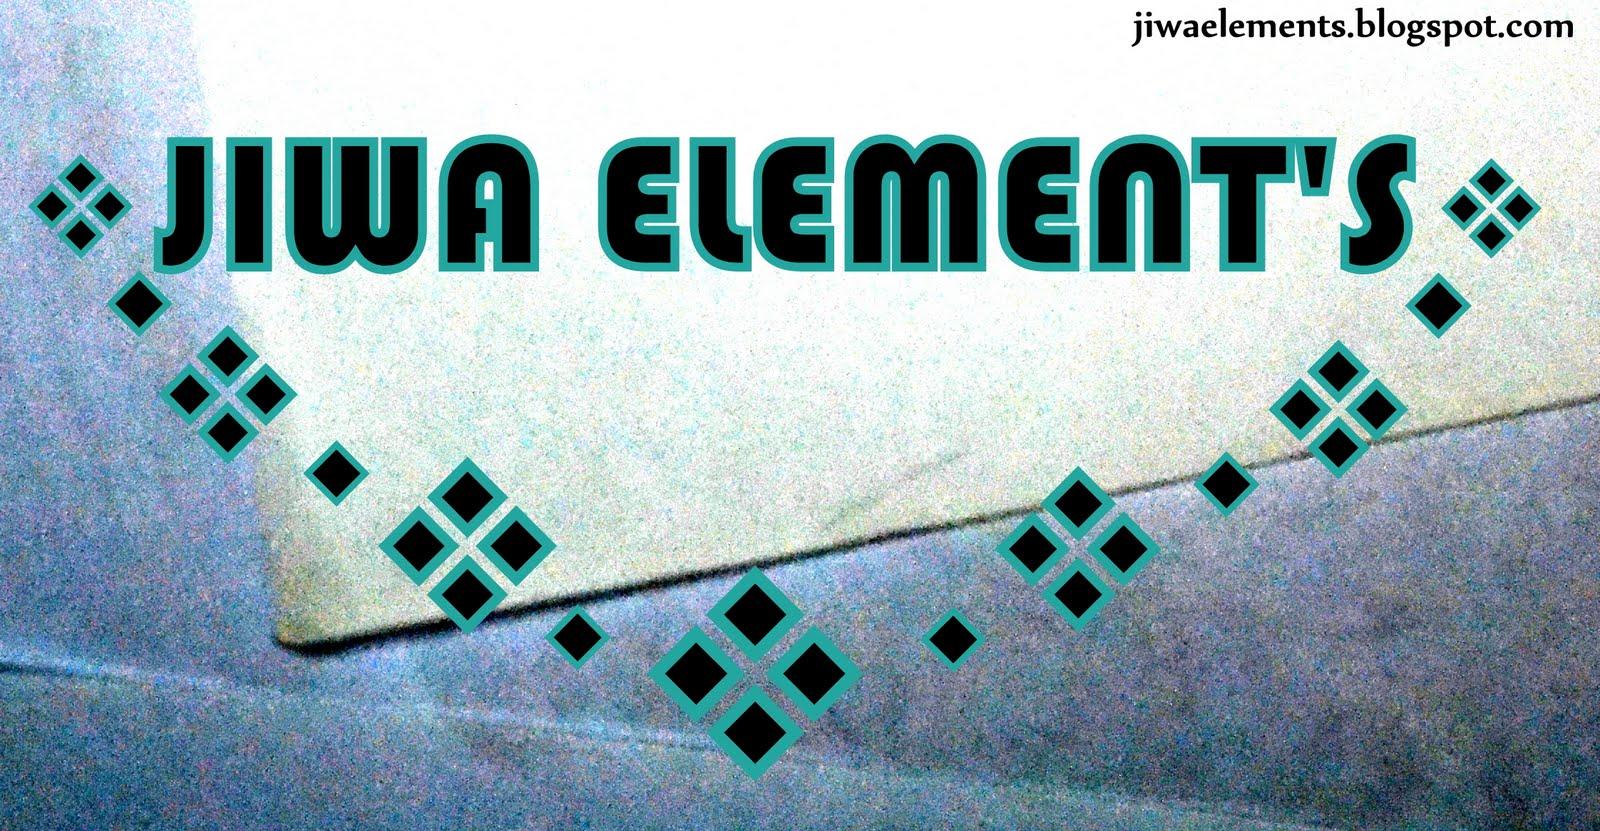 Jiwa Element's